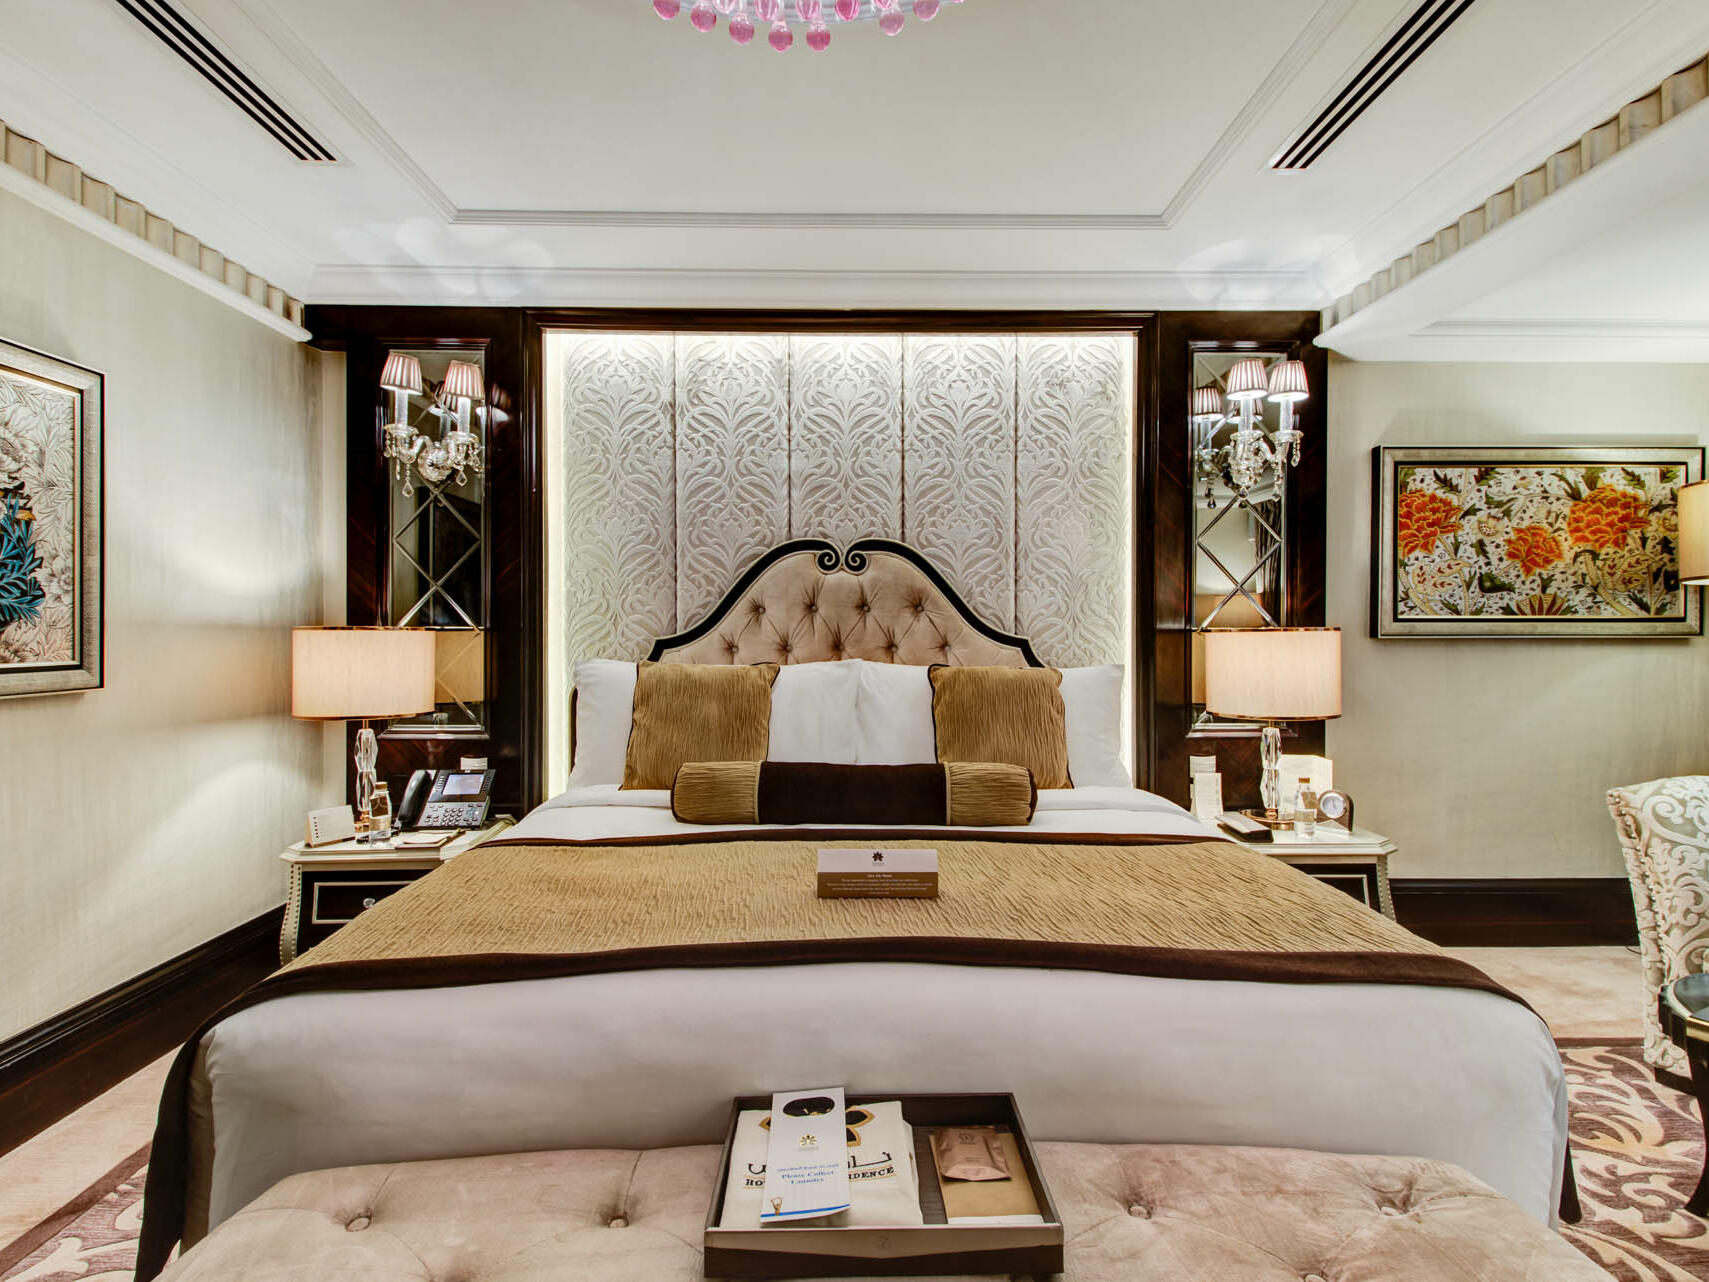 Premium Room at Narcissus Hotel & Spa Riyadh